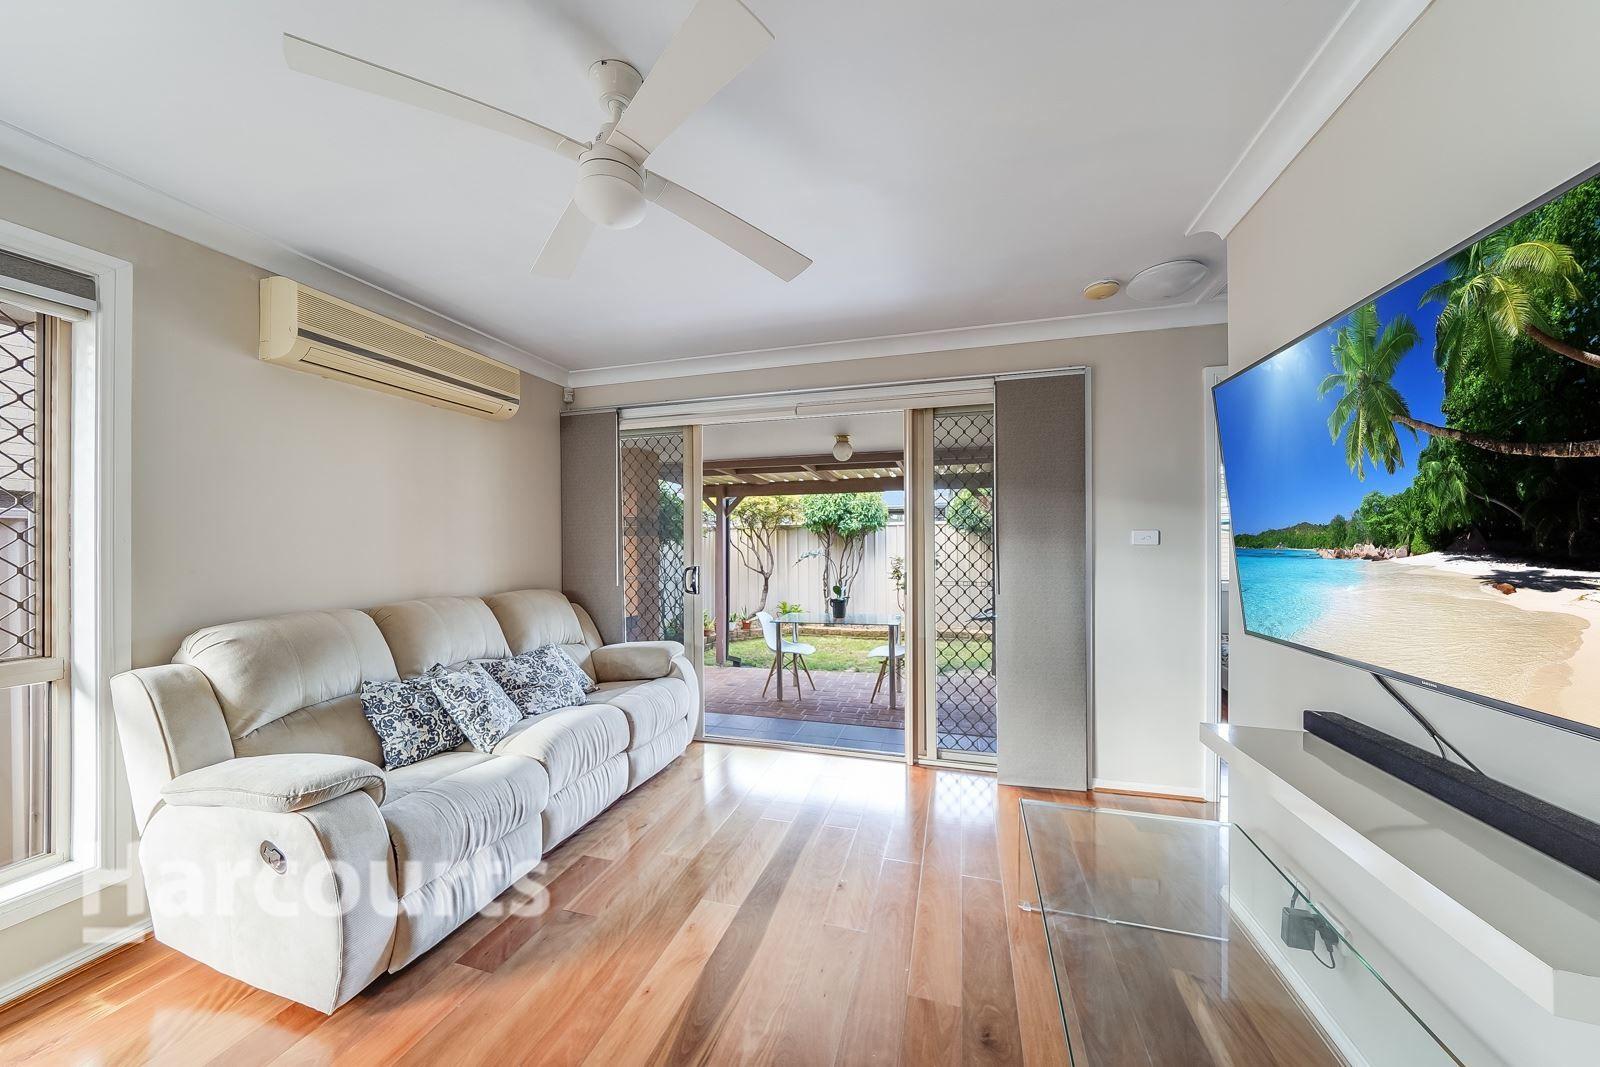 3/34 Allman Street, Campbelltown NSW 2560, Image 1